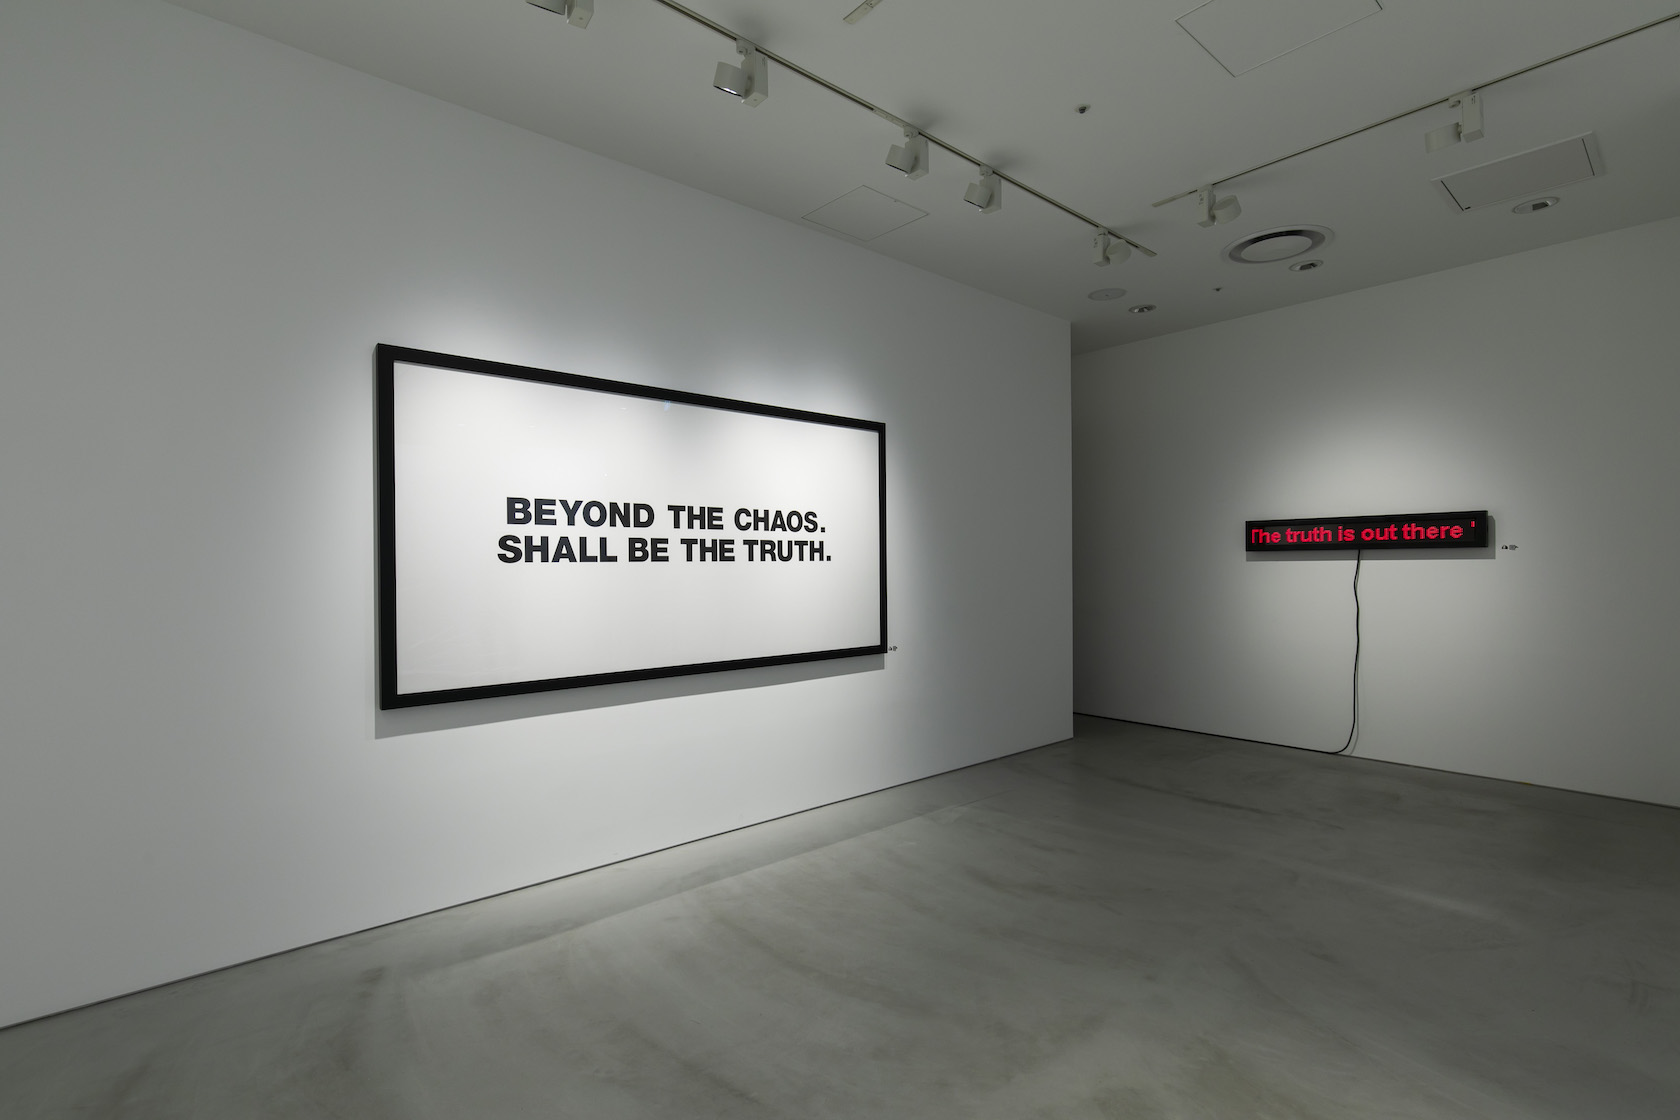 DAYZプロデュース、東京発ストリートブランドFPARが社会の「今」捉えた展覧会開催